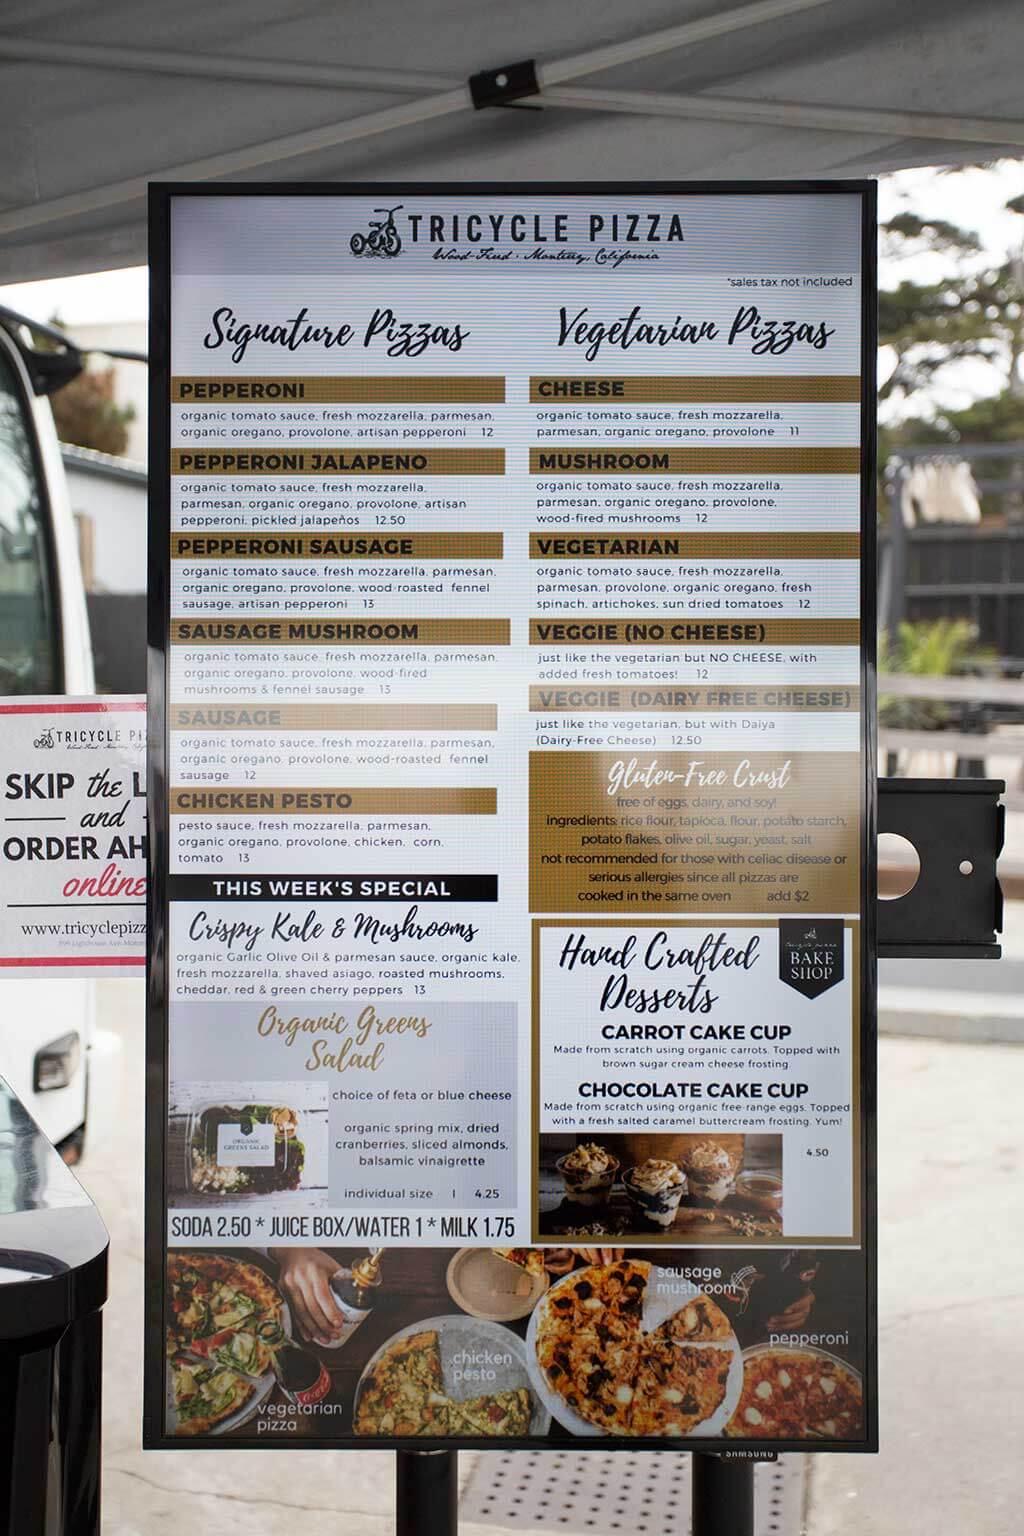 drive-swim-fly-tricycle-pizza-monterey-california-food-truck-bike-digital-menu